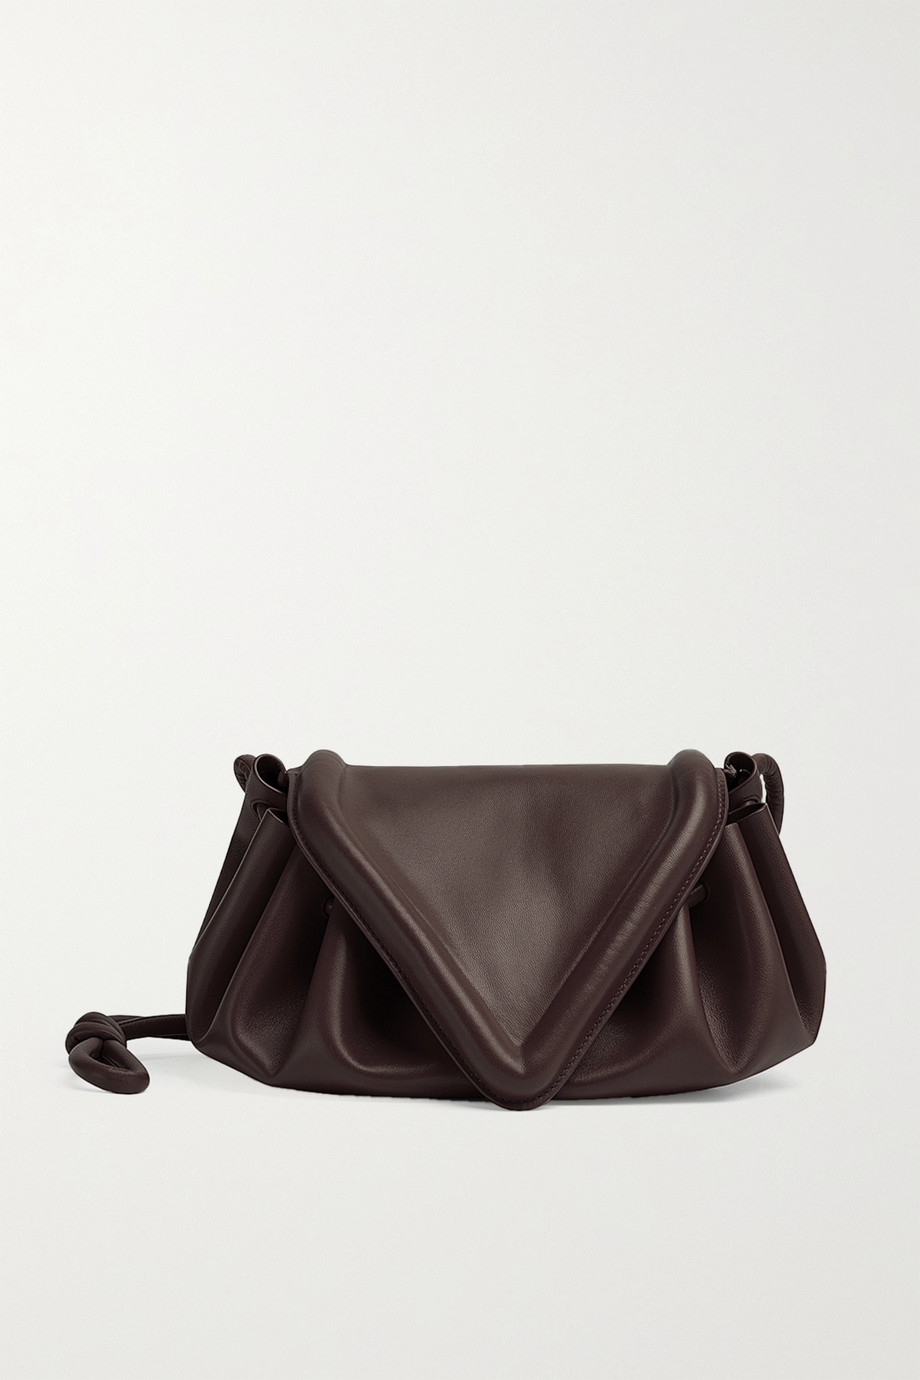 Bottega Veneta Sac porté épaule en cuir Beak Medium